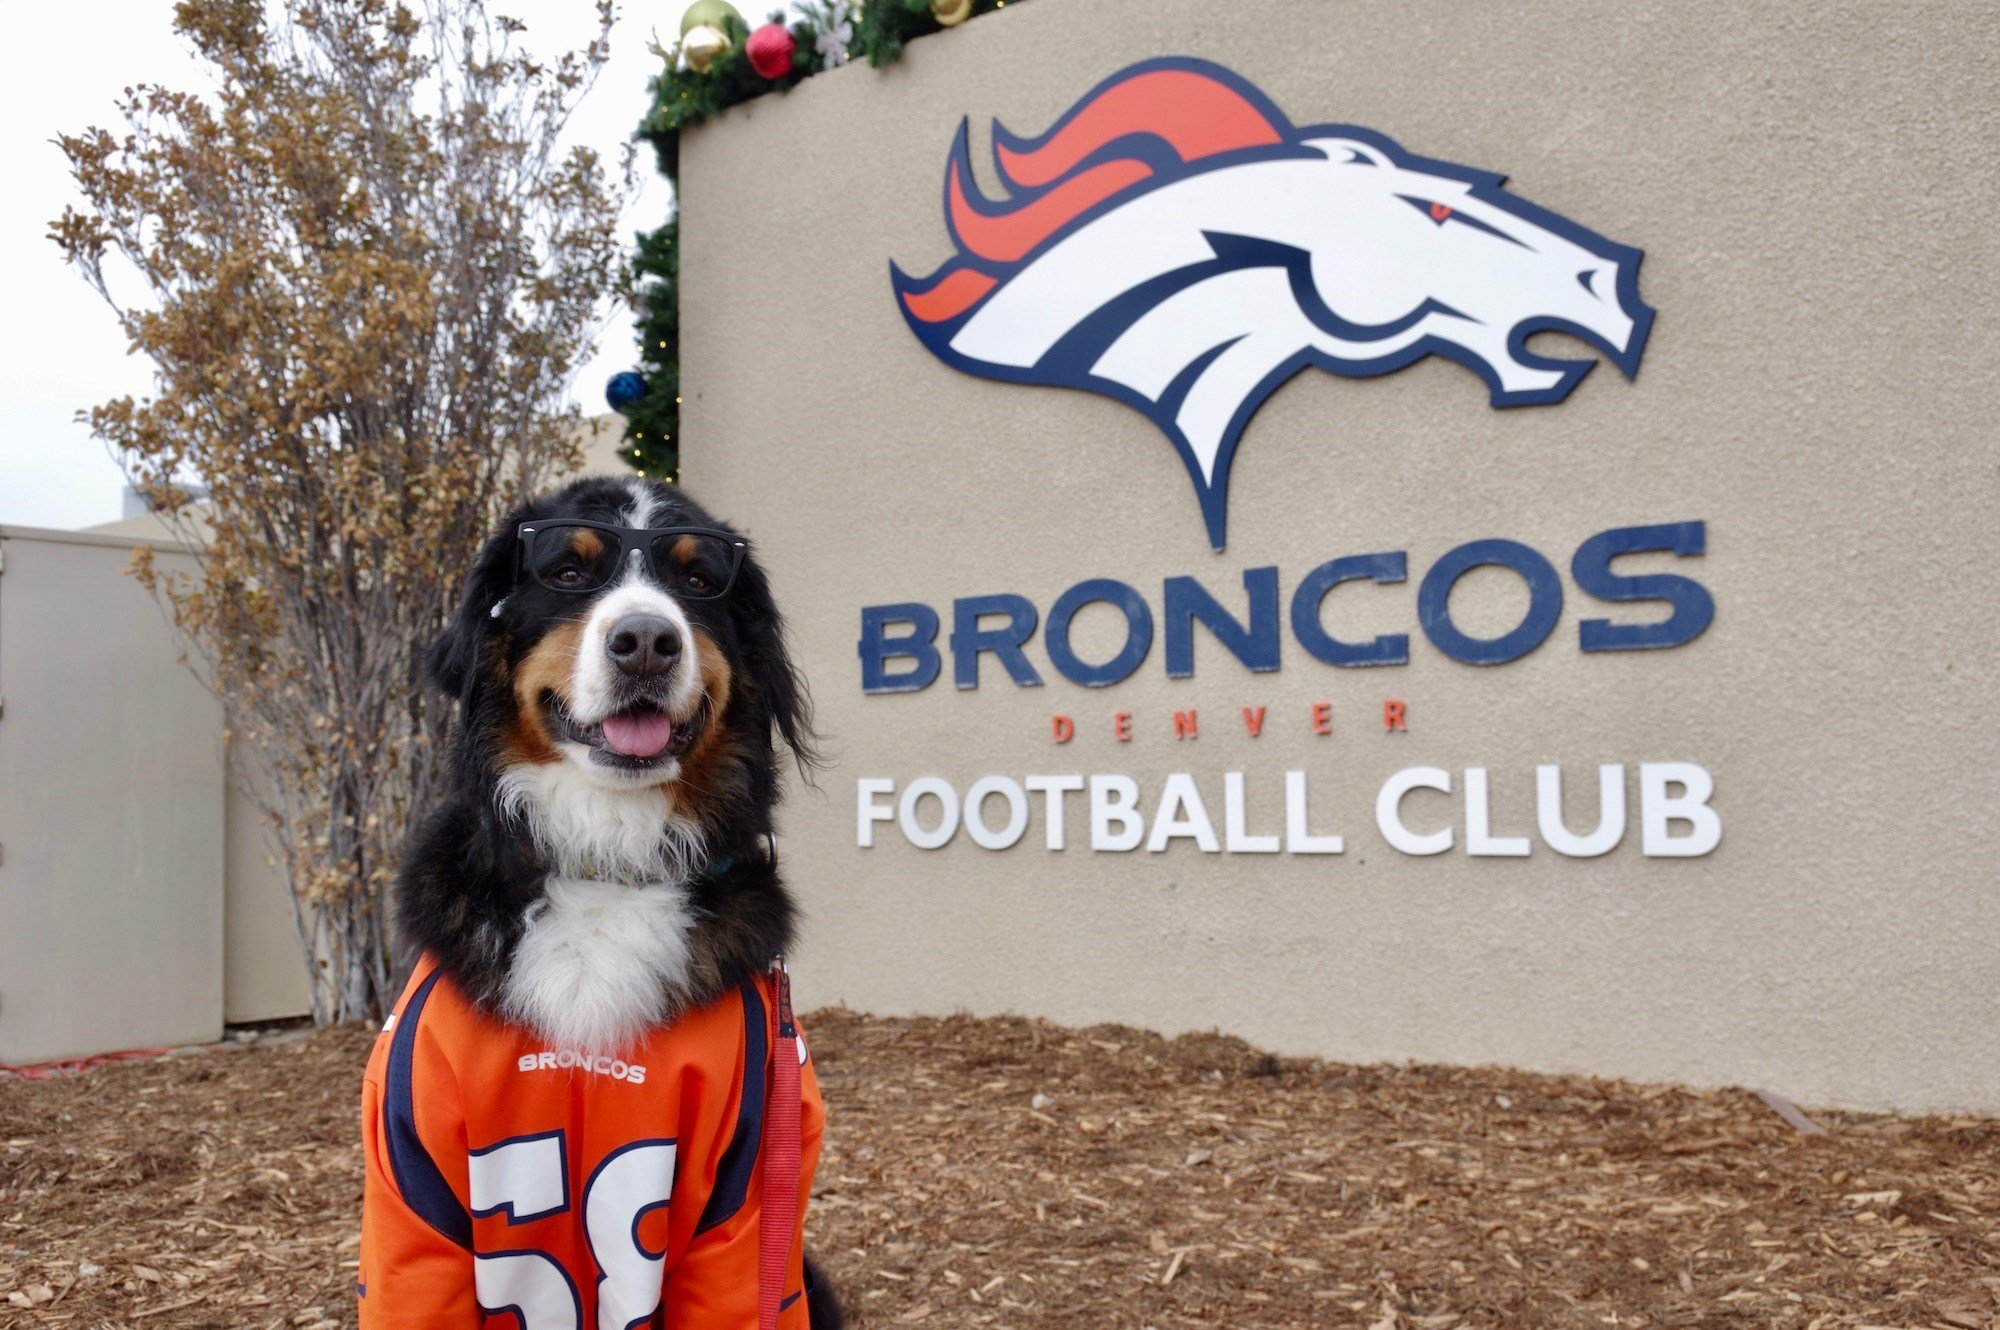 Toby the Bernese Mountain Dog visits Denver Broncos (Courtesy: Dustin Schaefer)